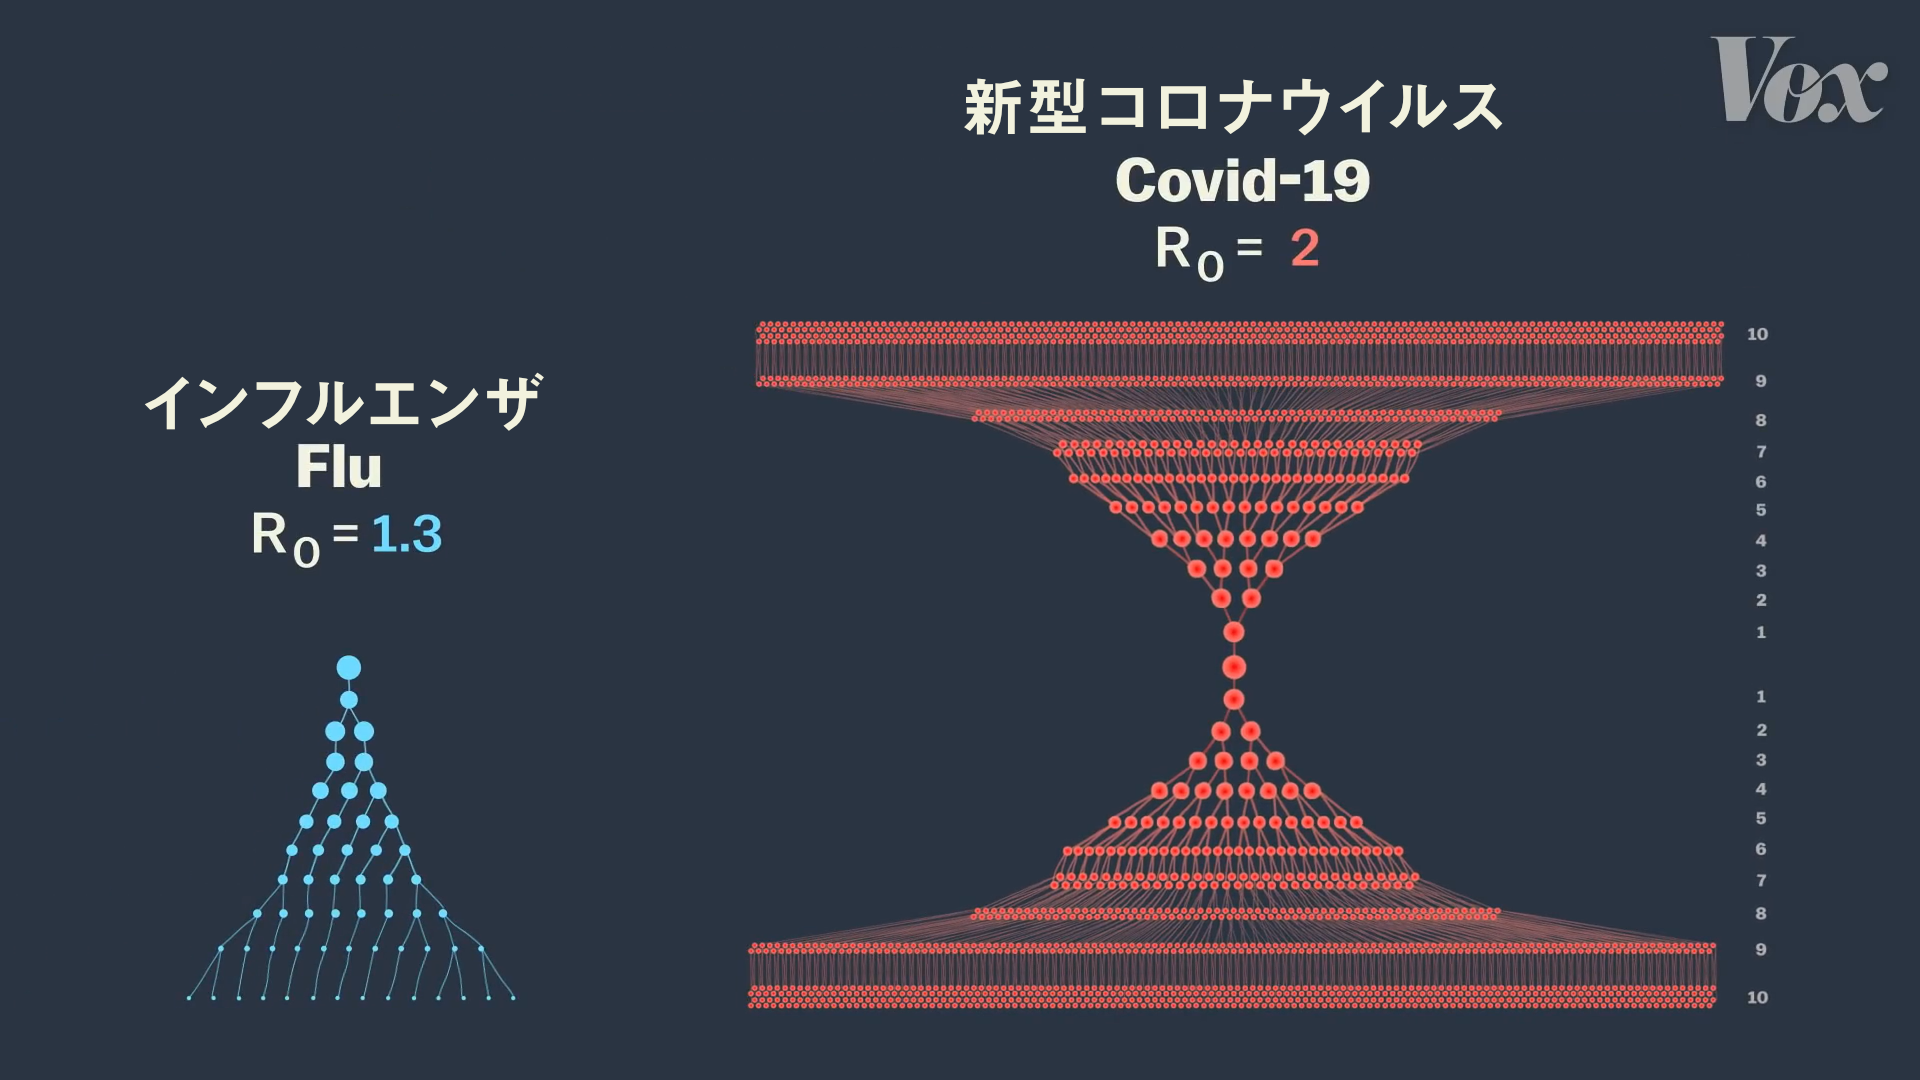 f:id:Imamura:20200408133209p:plain